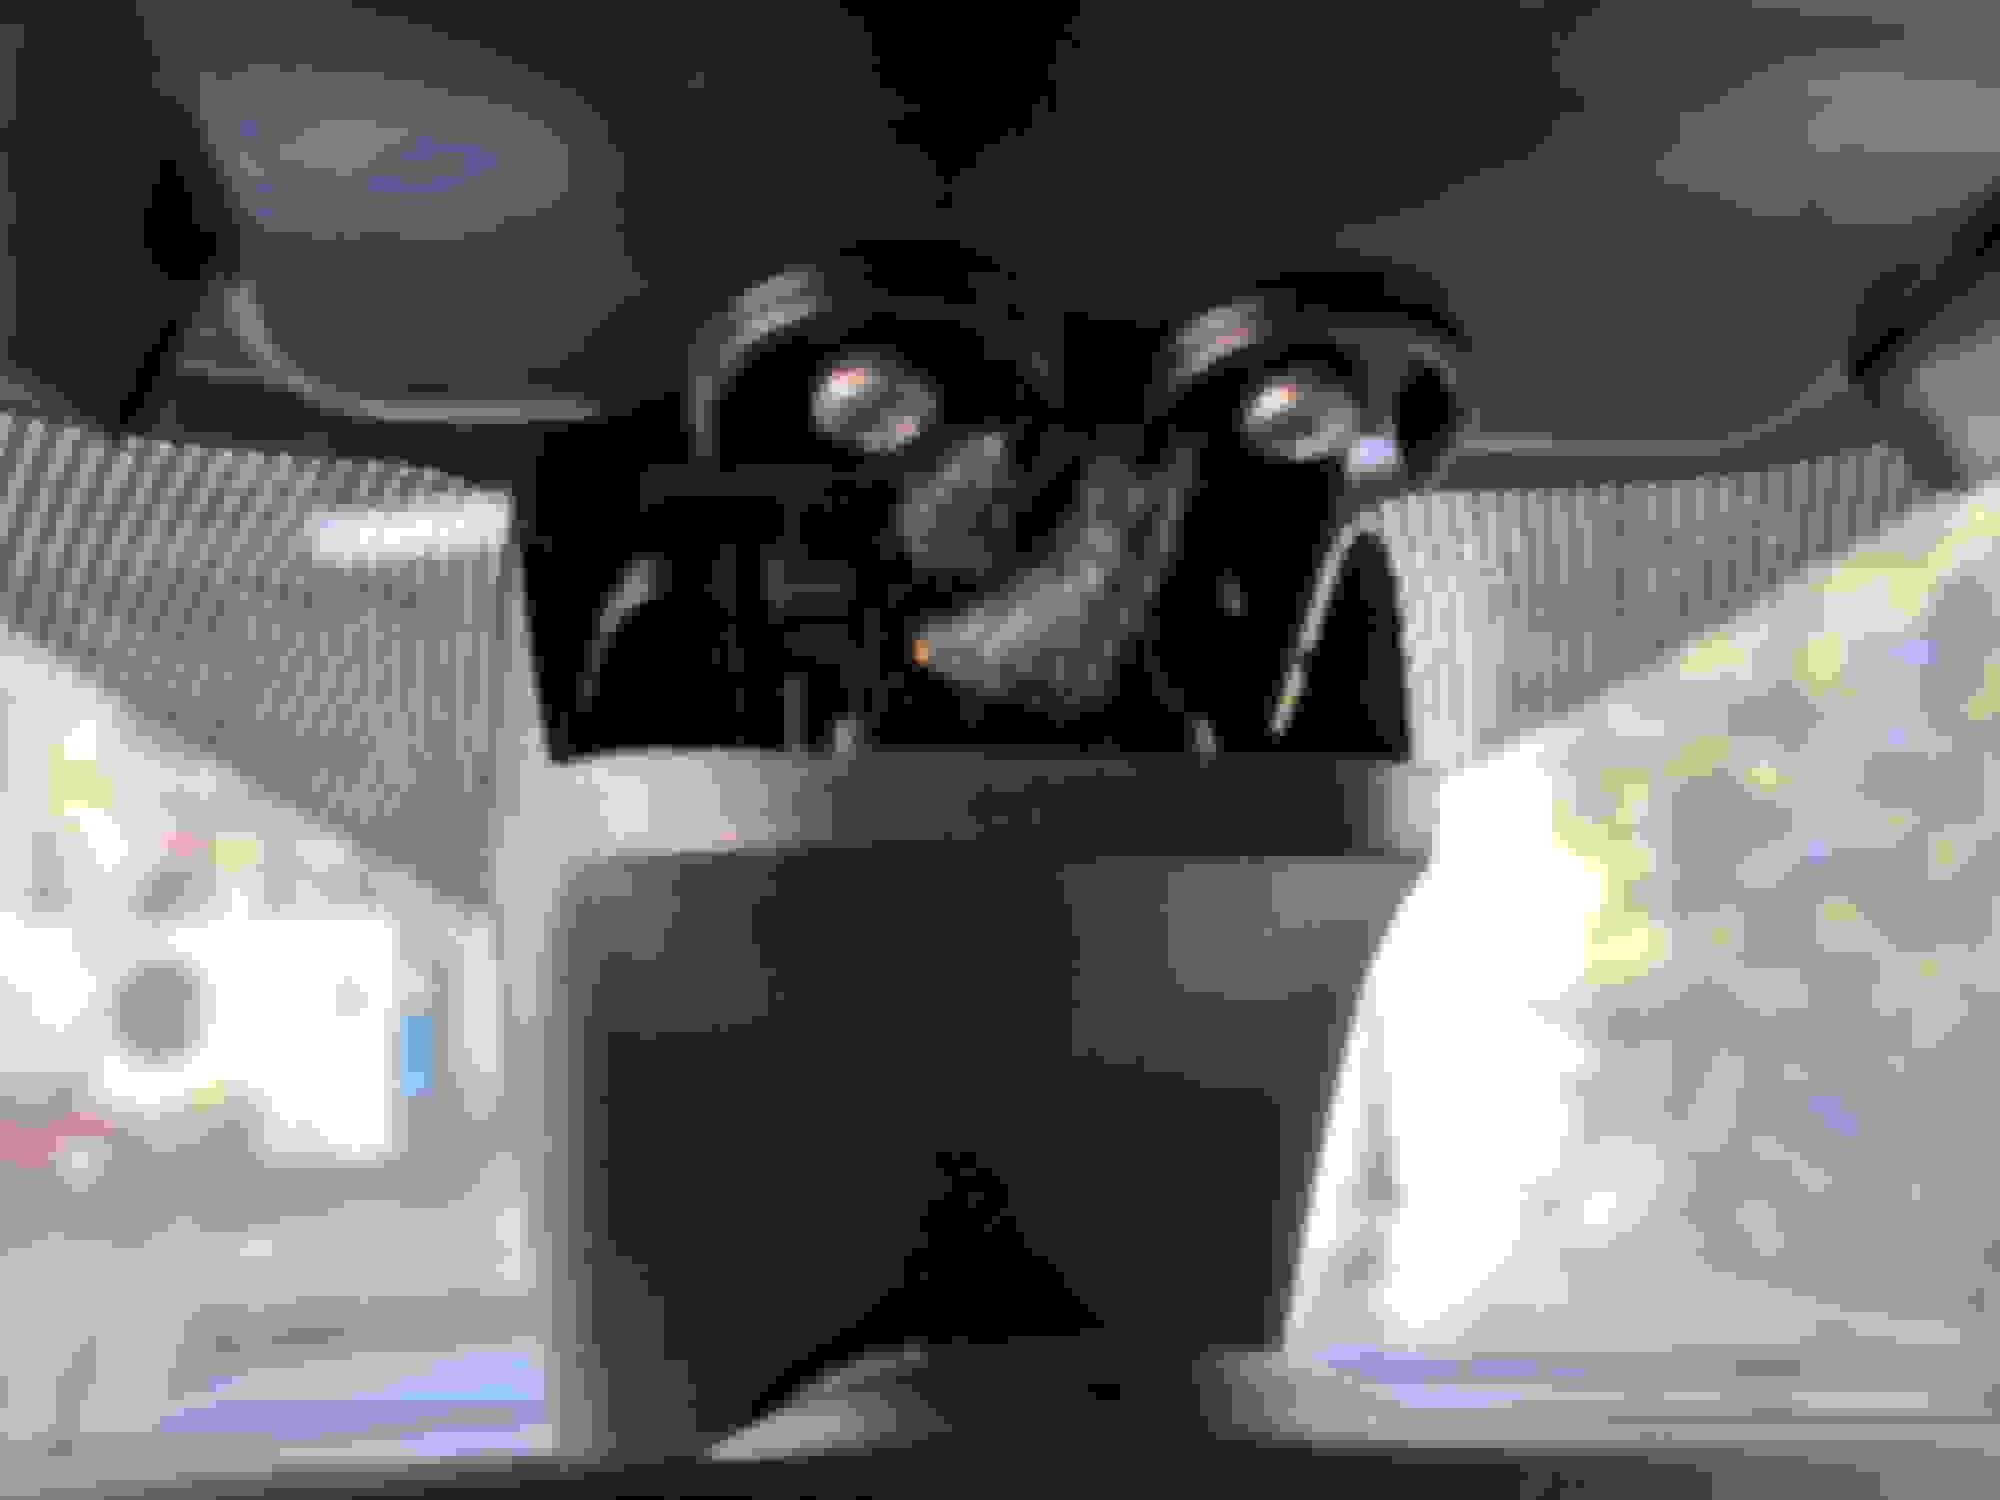 dashcam + radar detector hard wire - AudiWorld Forums